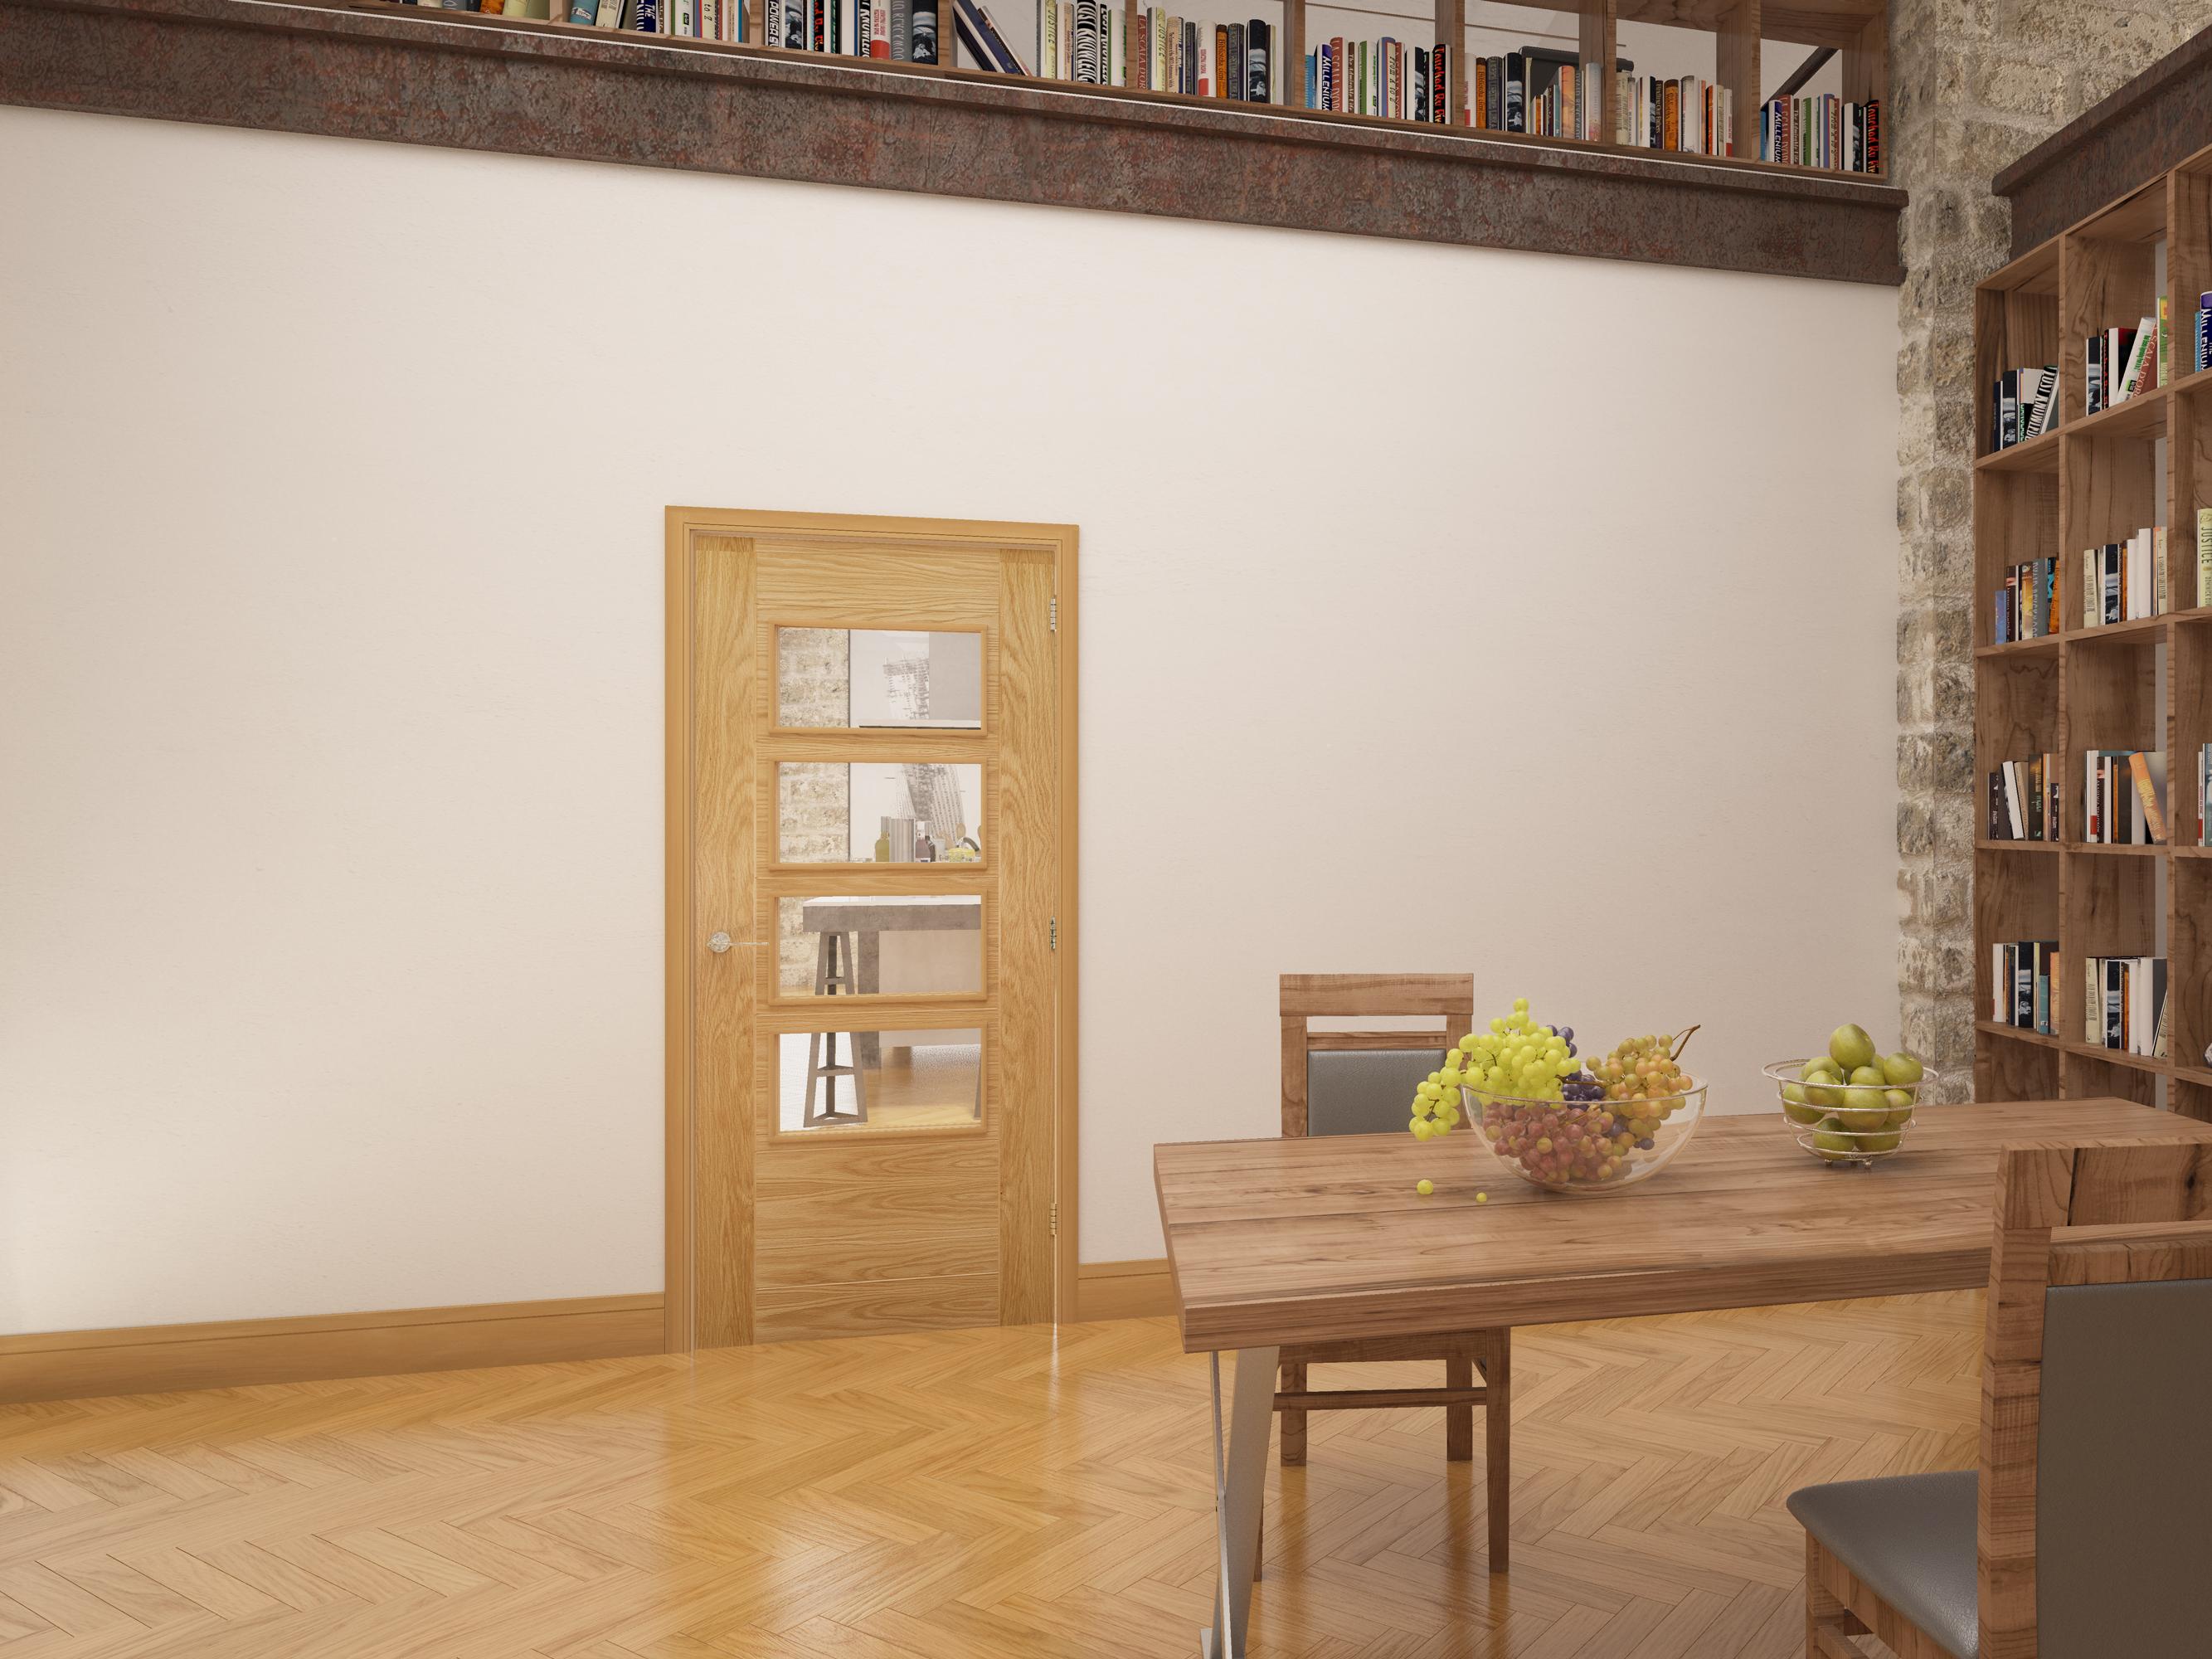 Seville glazed oak interior door